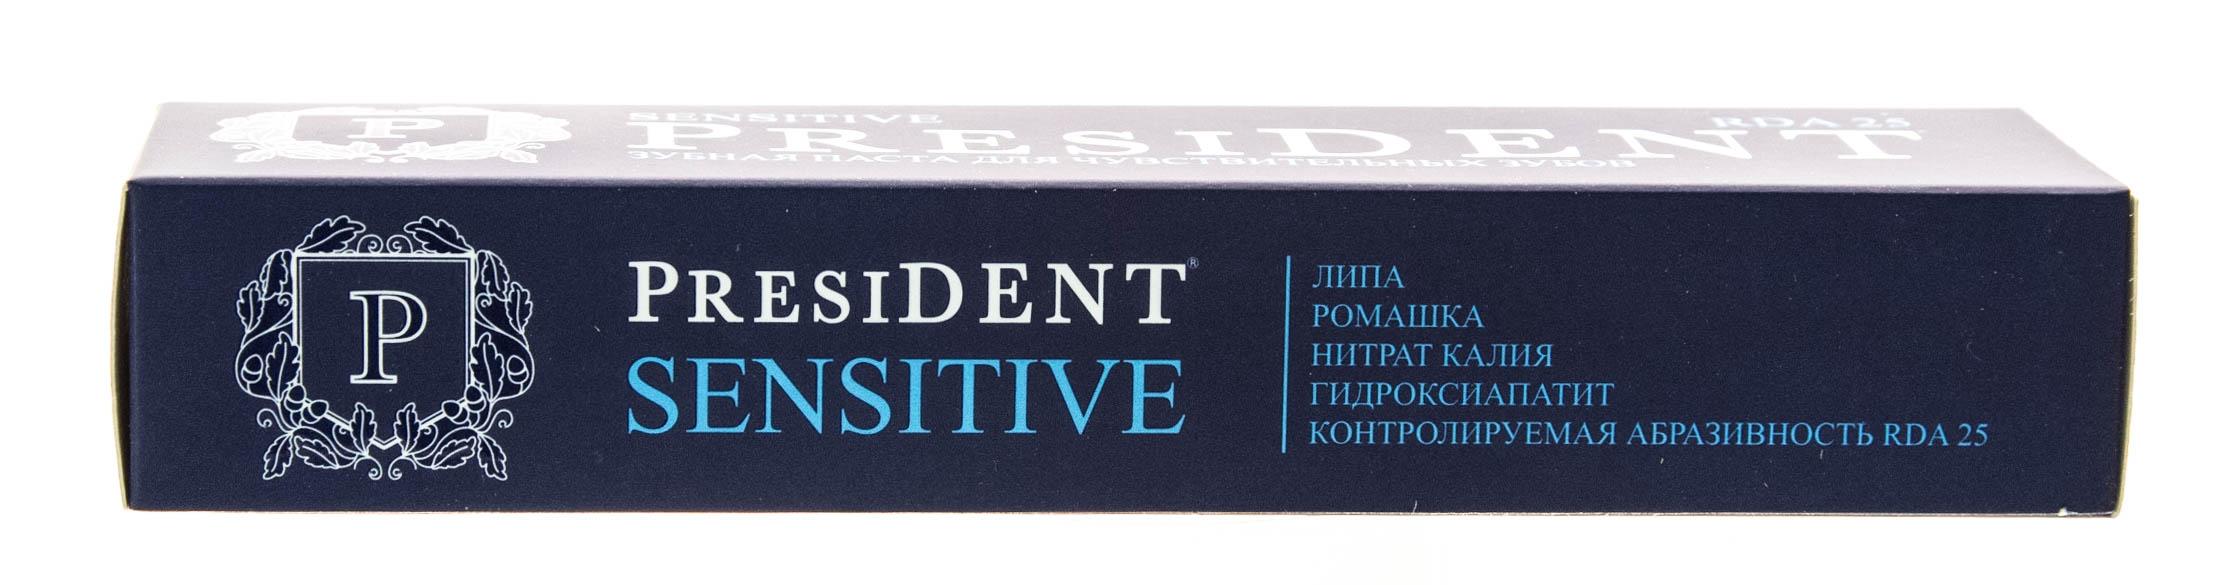 President Сенситив паста зубная 100 мл (President, Sensitive)